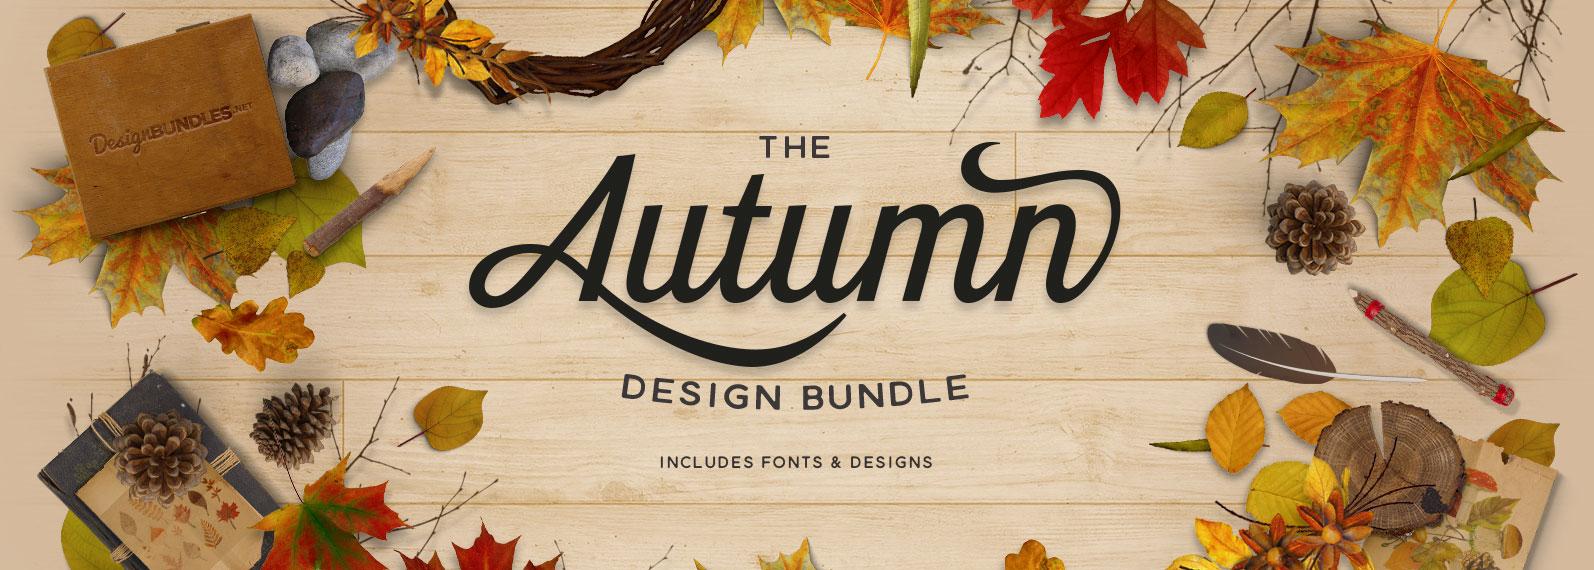 The Autumn Design Bundle Cover